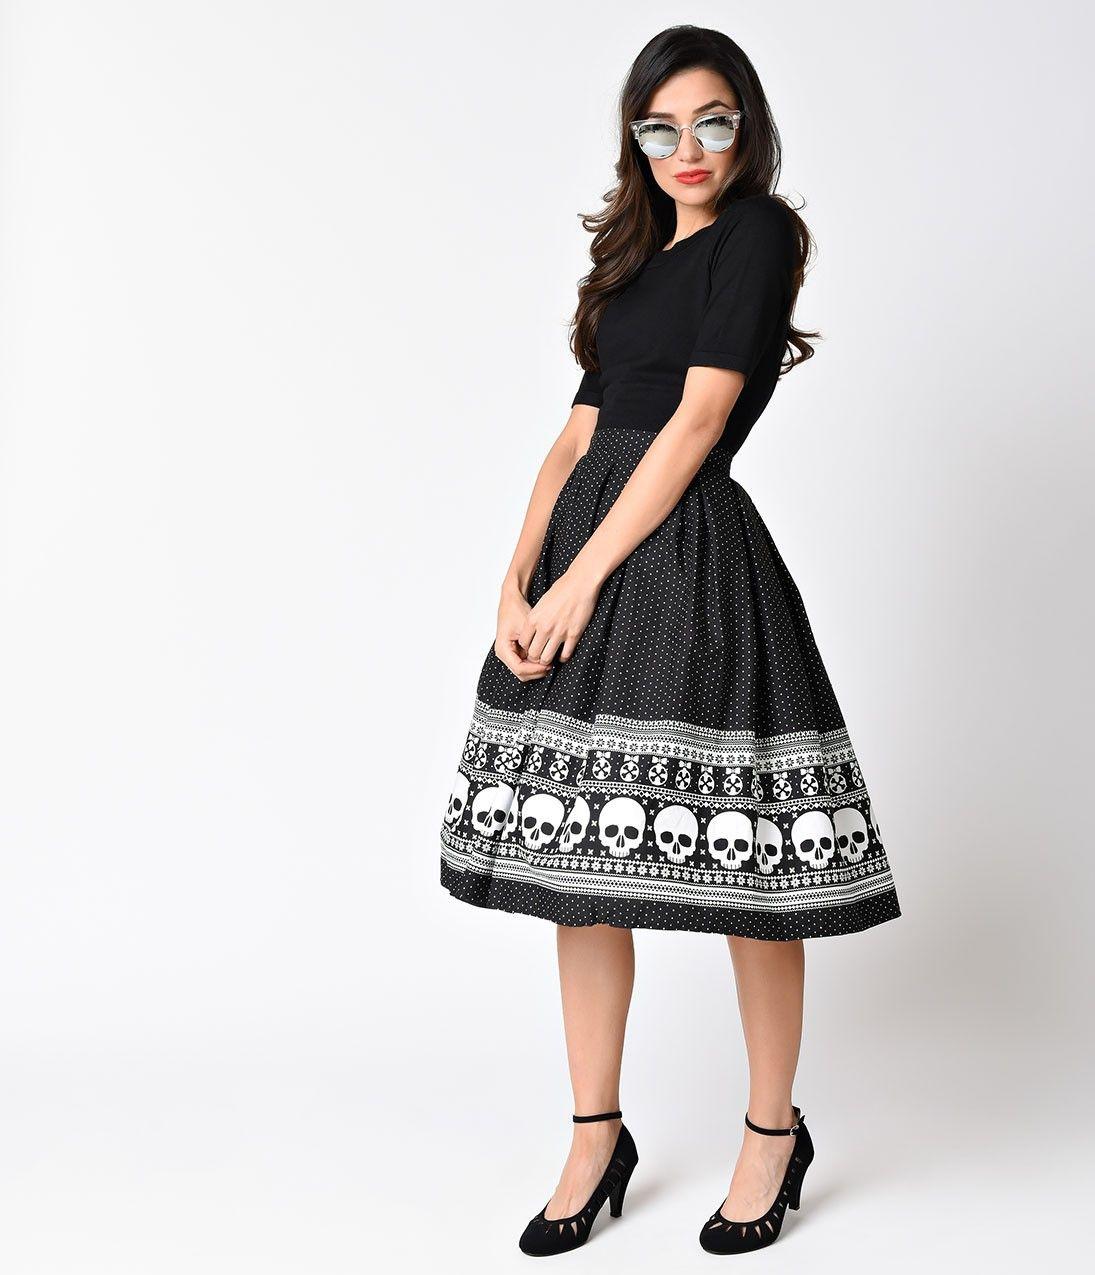 Hell Bunny Pokerface Pinafore Dress Black White Vintage Fashion